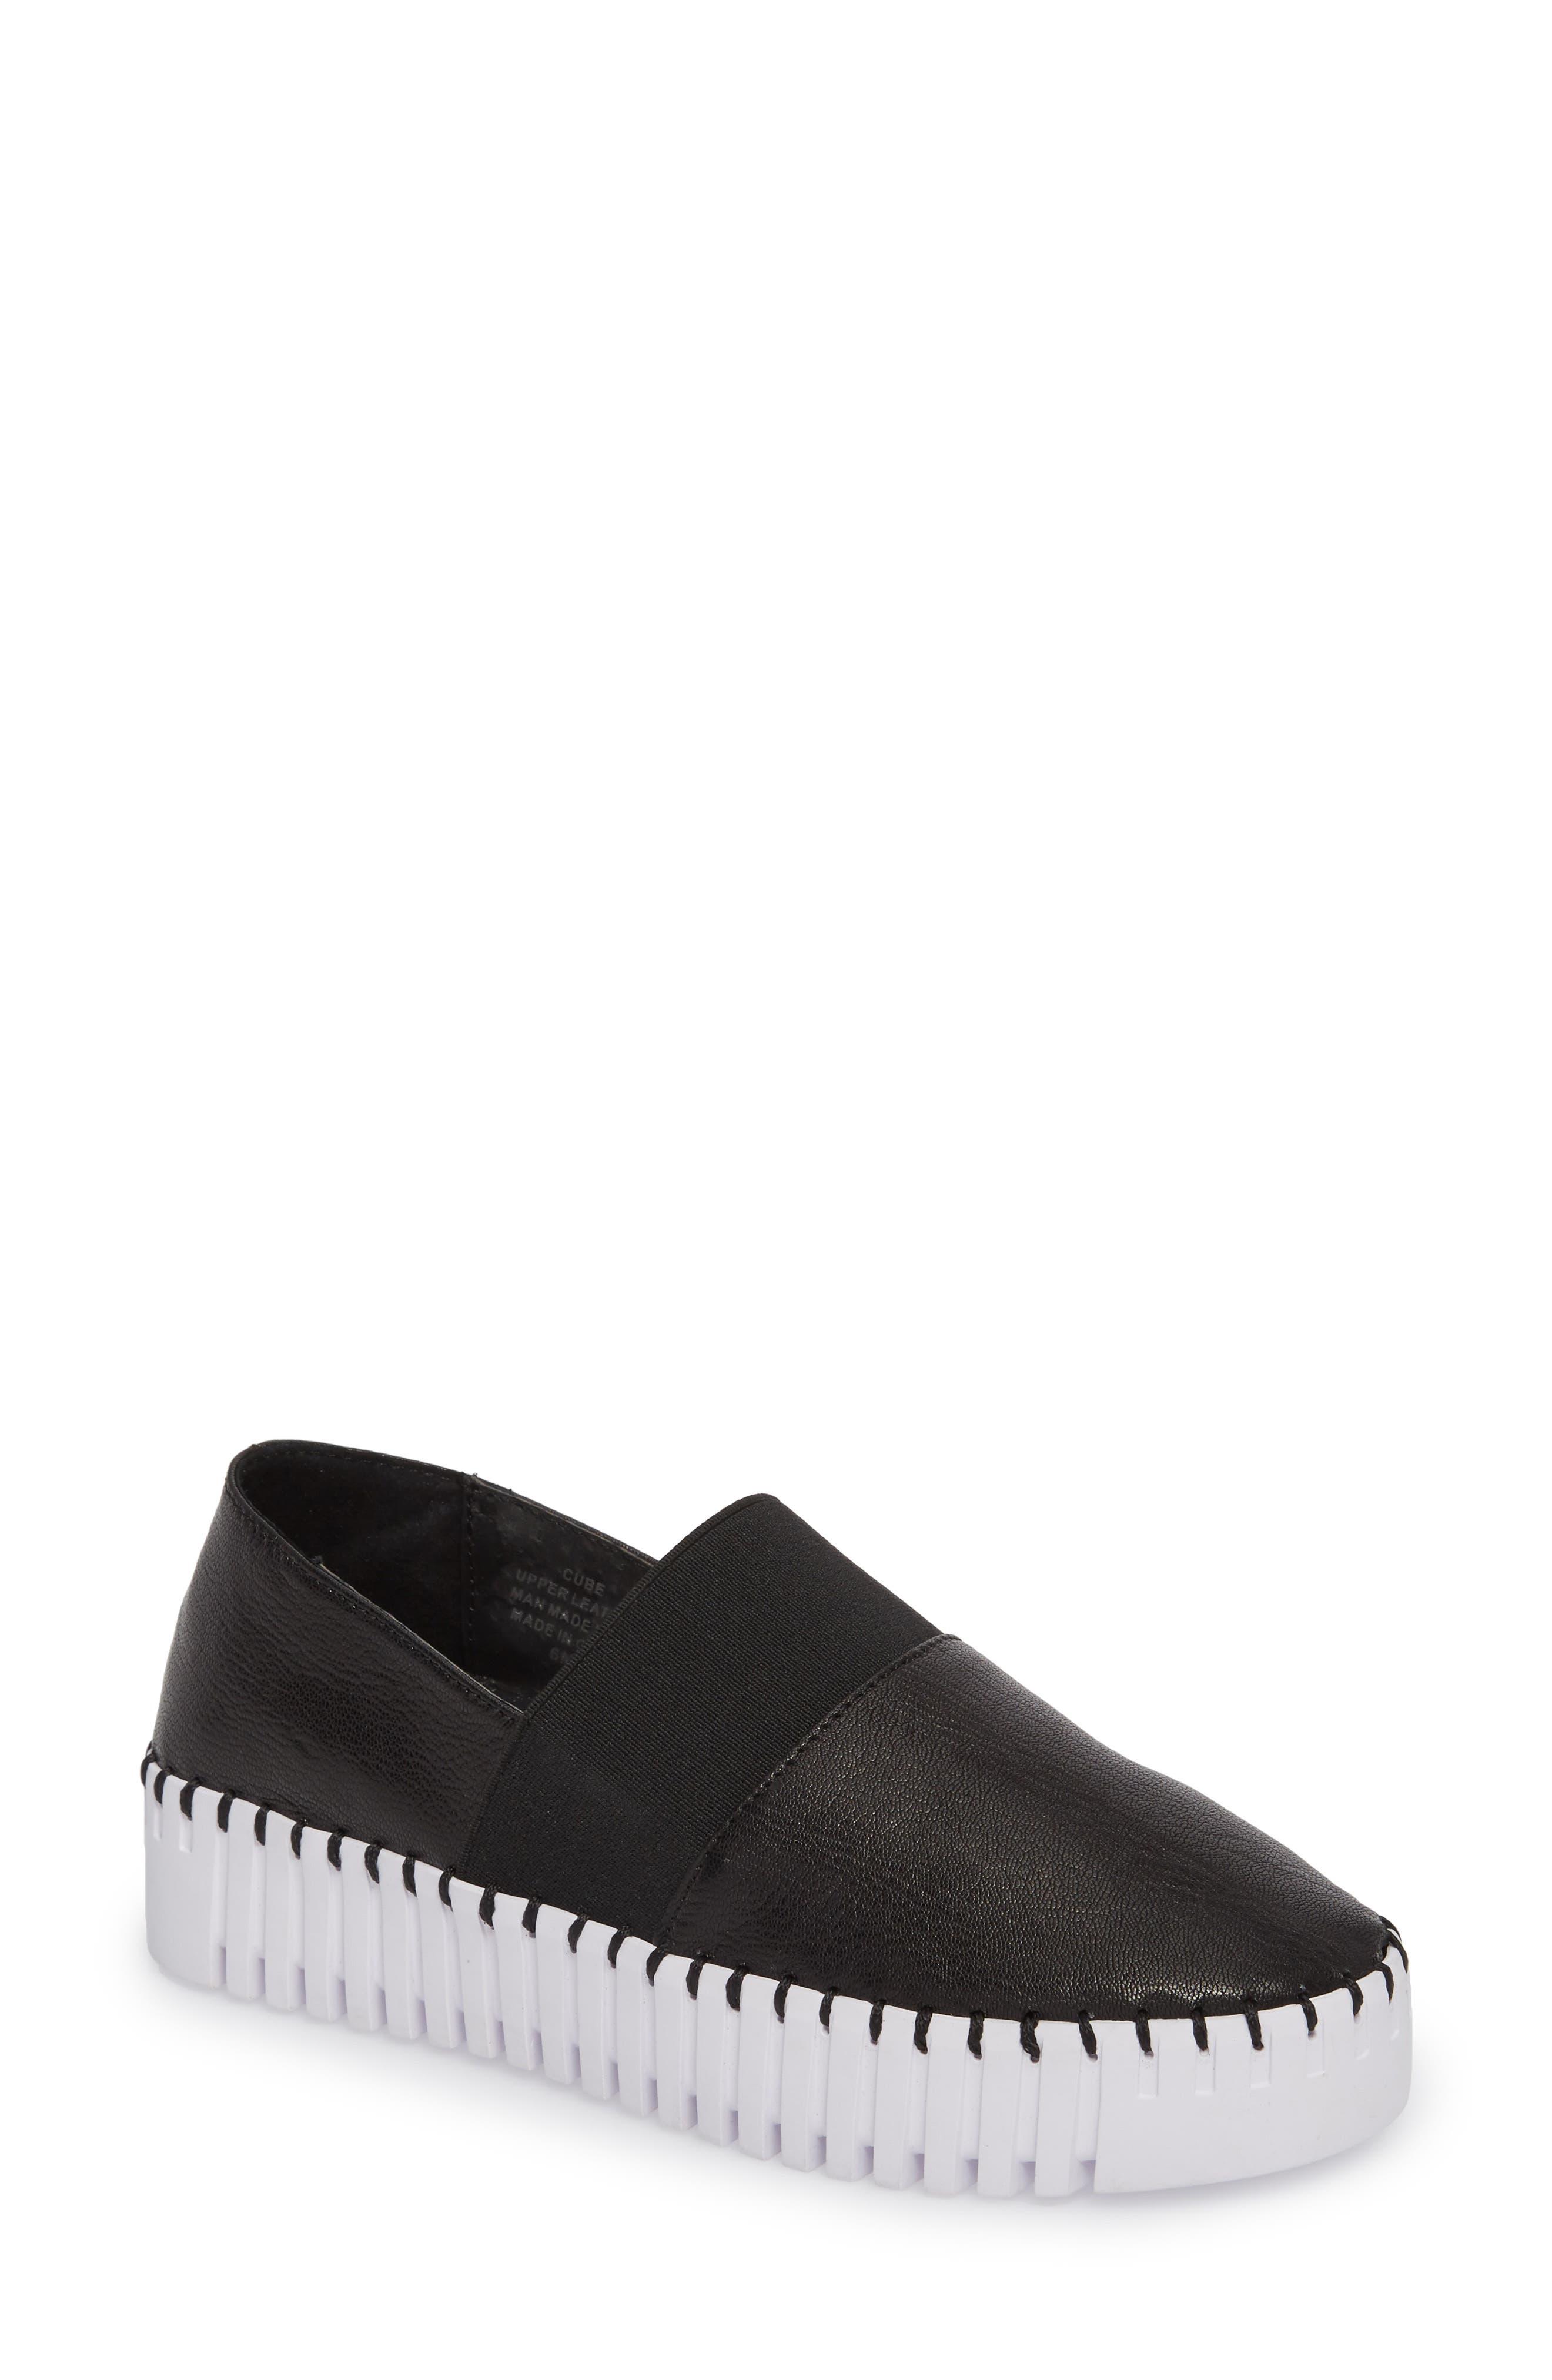 Alternate Image 1 Selected - Jeffrey Campbell Cube Slip-On Platform Sneaker (Women)